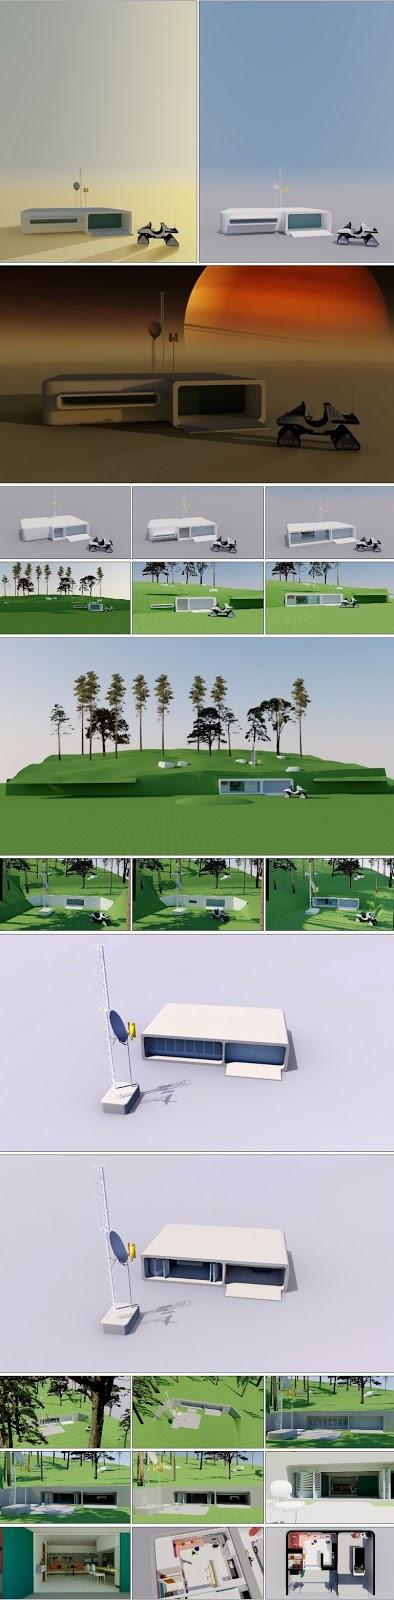 http://restive.za.net/visual/architecture/ah76_2.html